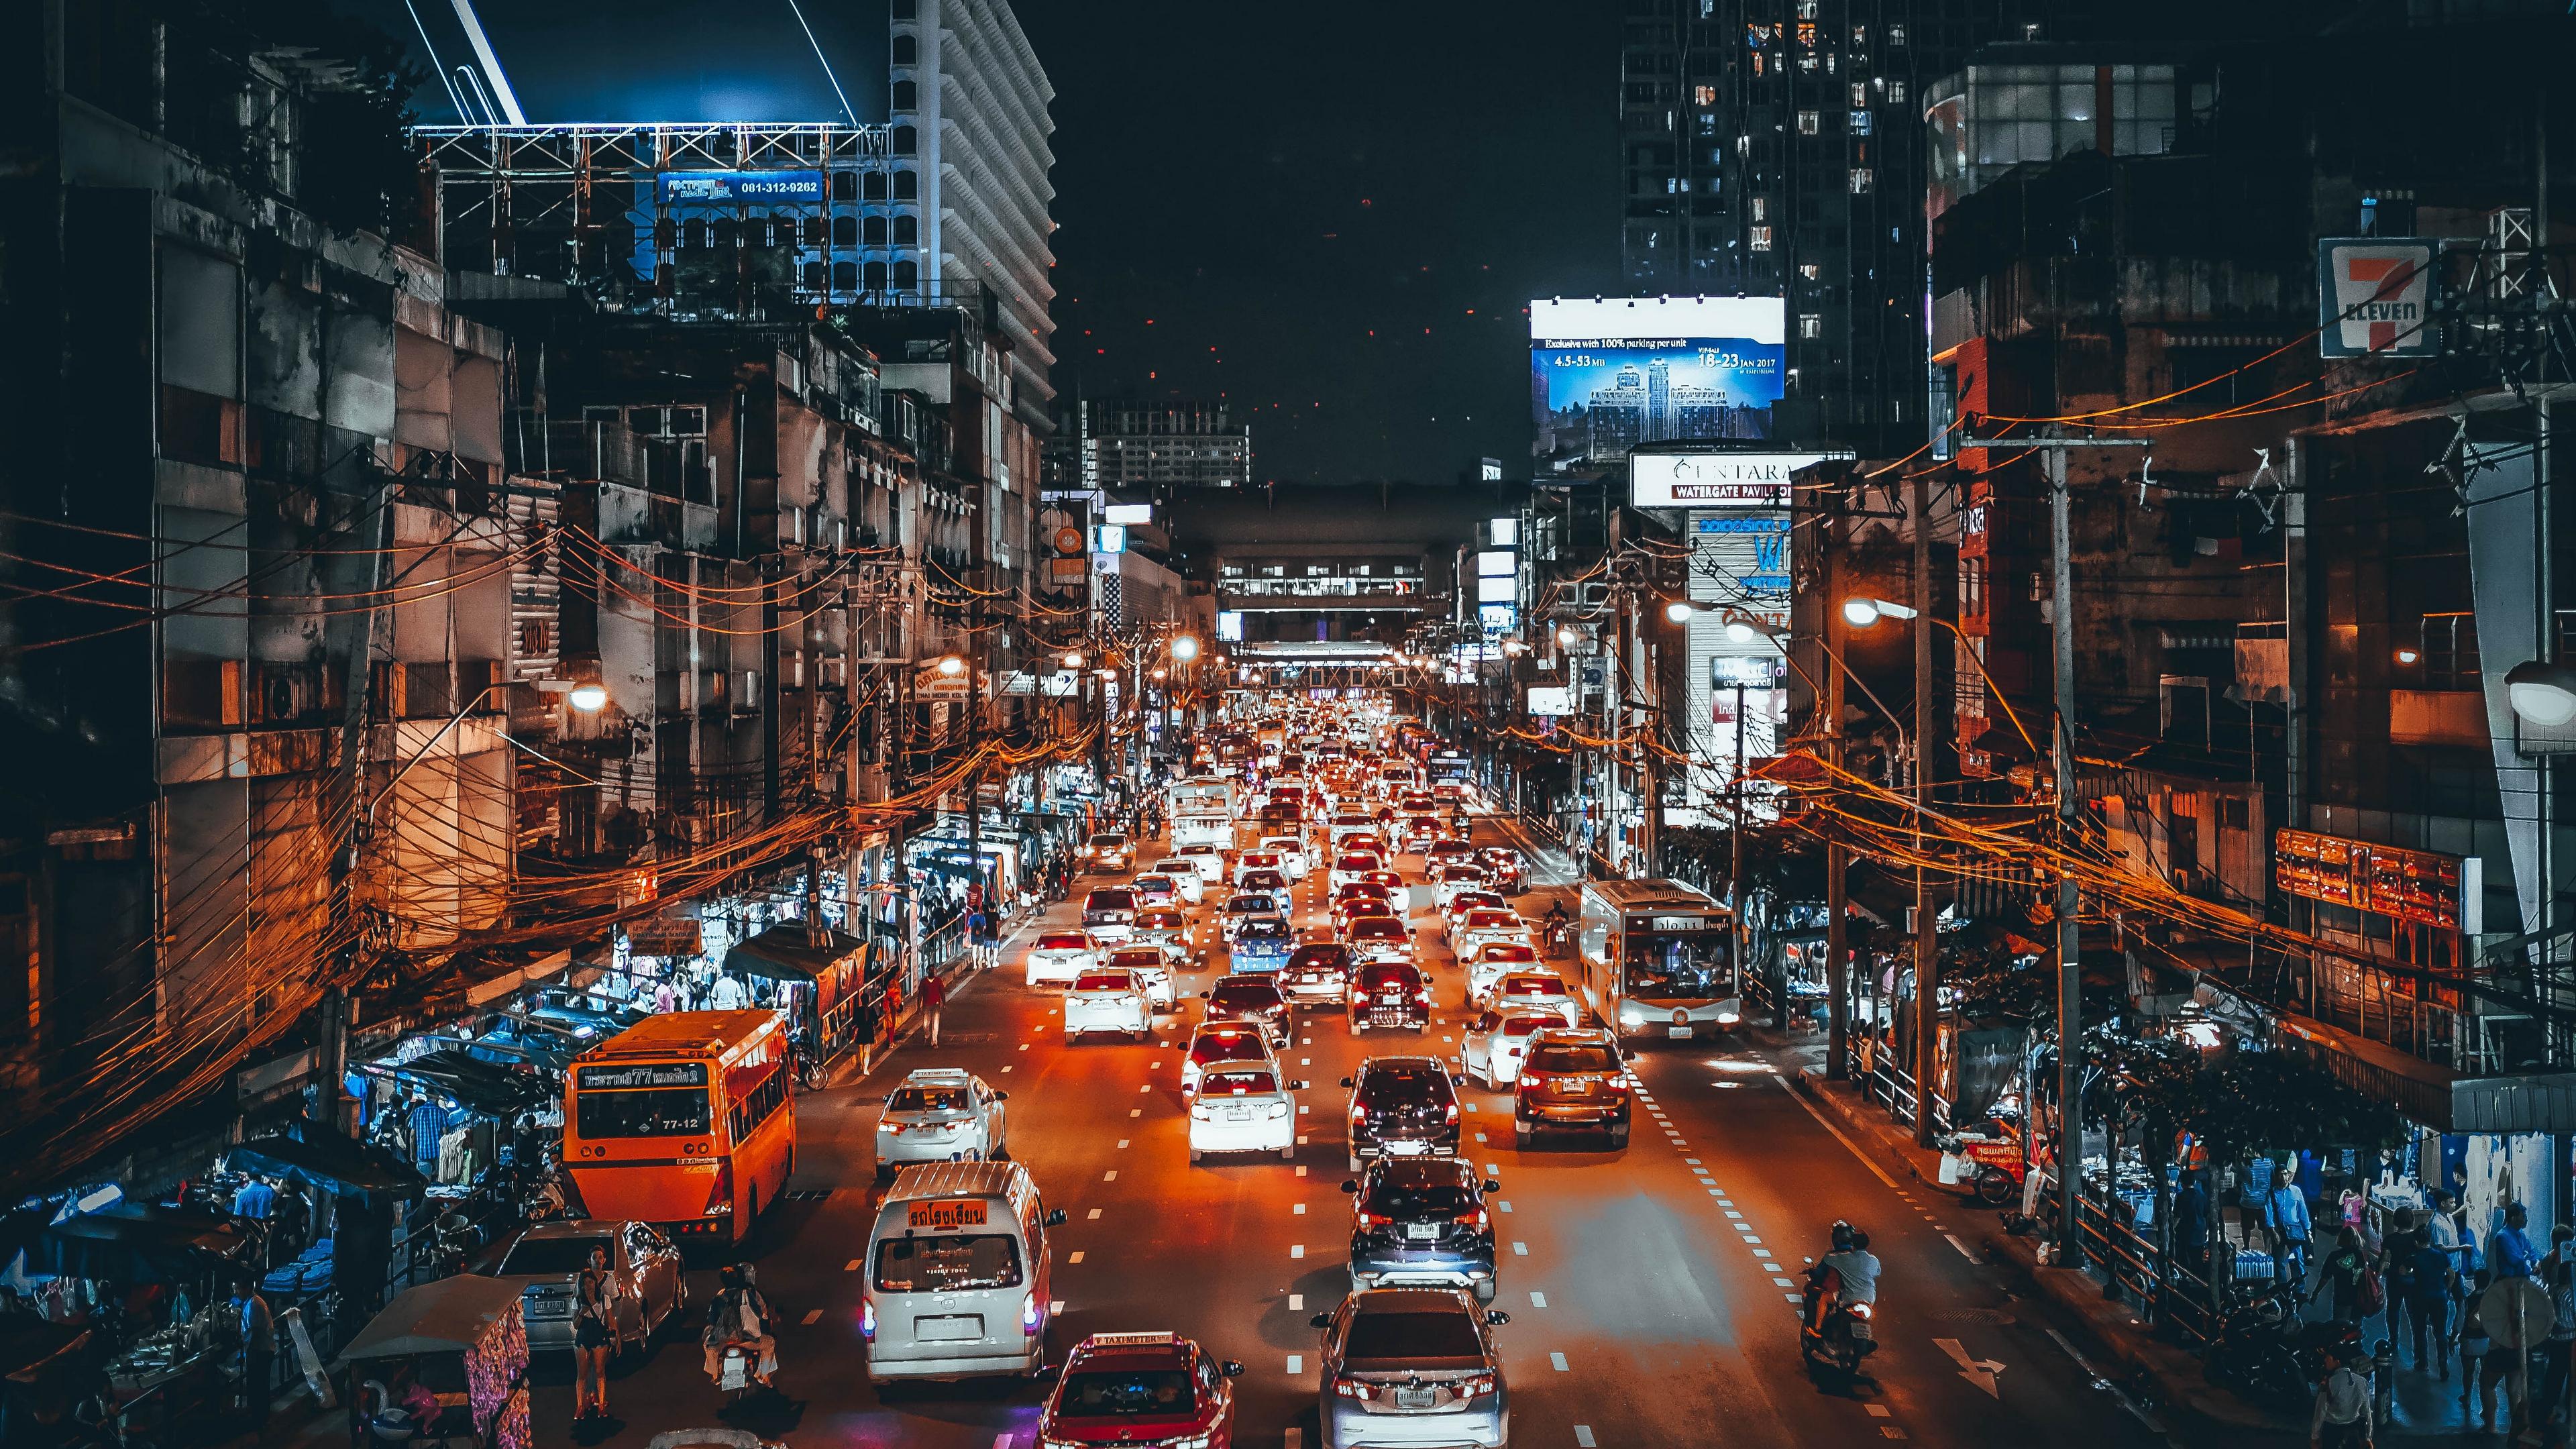 traffic cars street night 4k 1538066869 - traffic, cars, street, night 4k - Traffic, Street, Cars